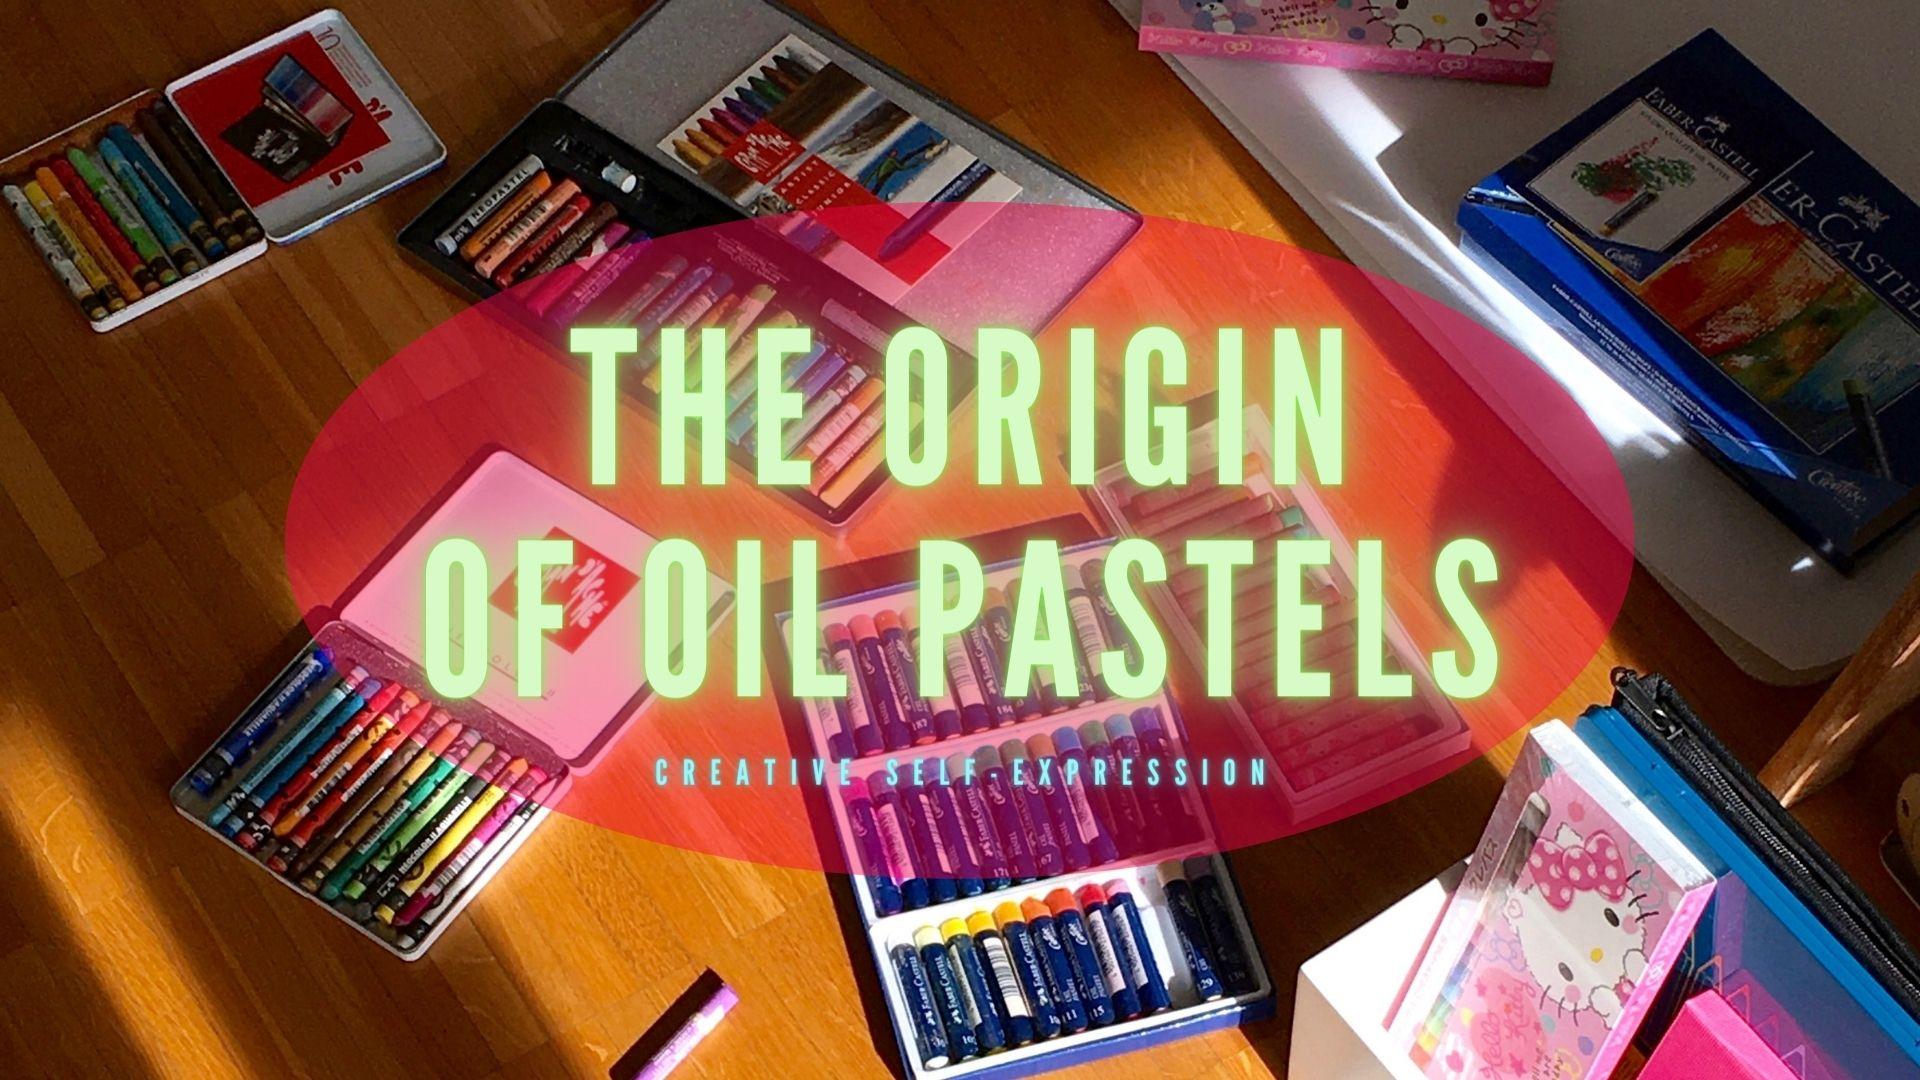 THE ORIGIN OF OIL PASTELS